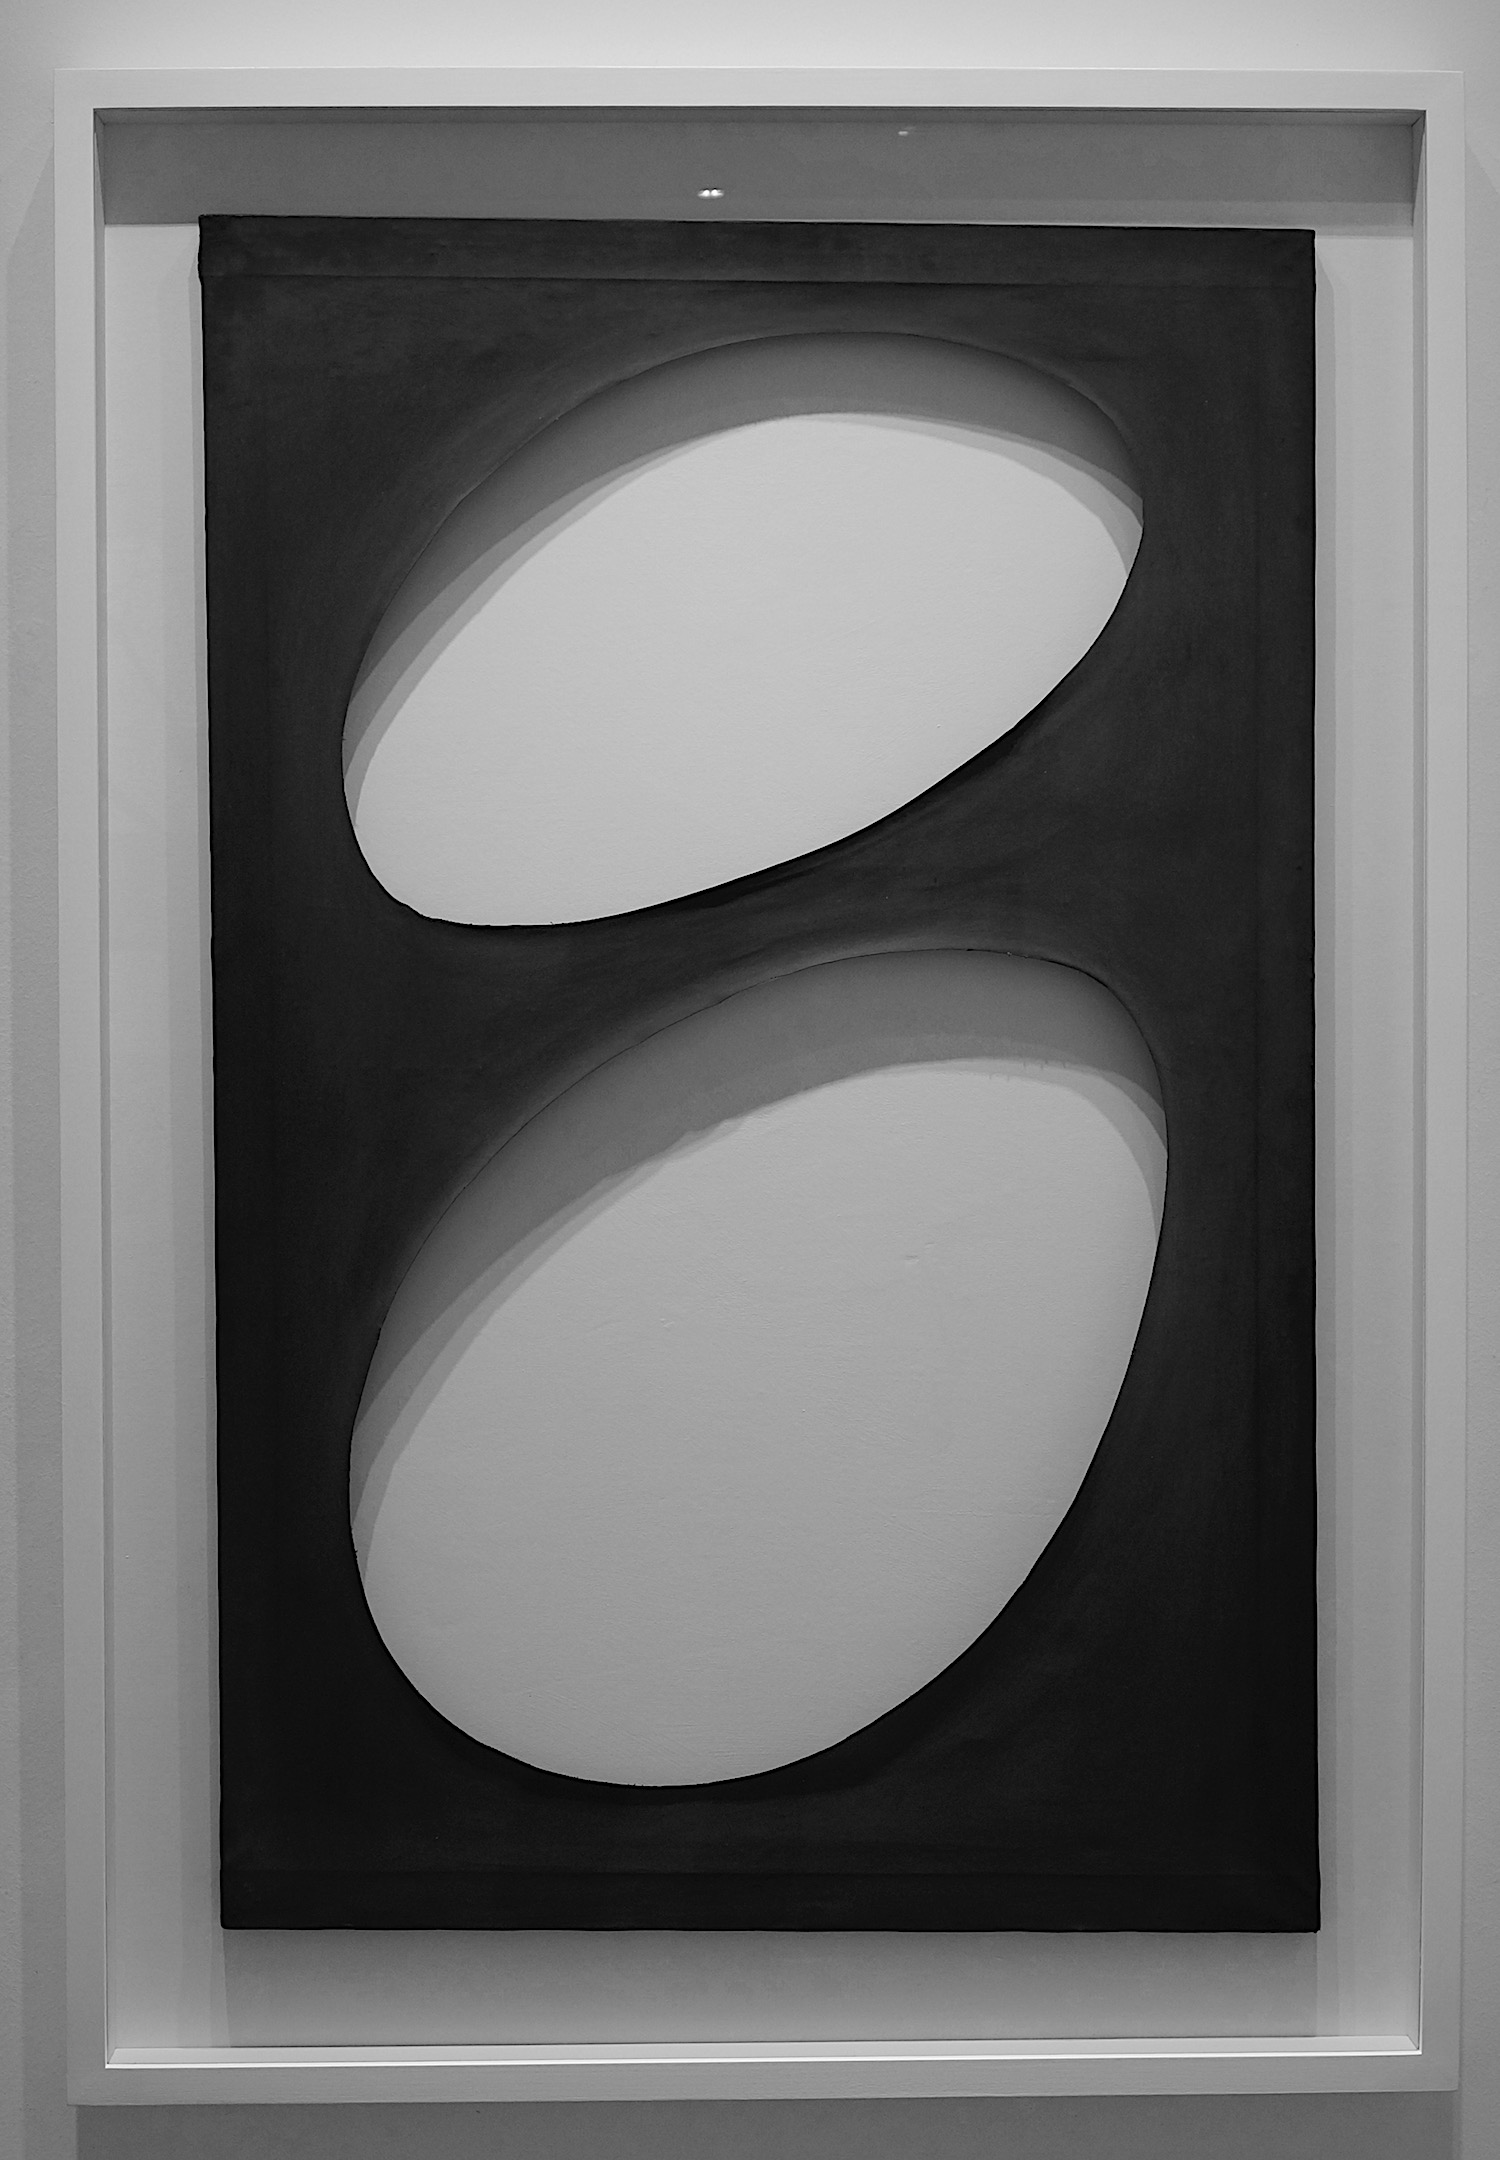 Dadamaino Volume, 1960 water based paint on canvas 108 x 70 cm   42 1/2 x 27 1/2 in DAD/M 7